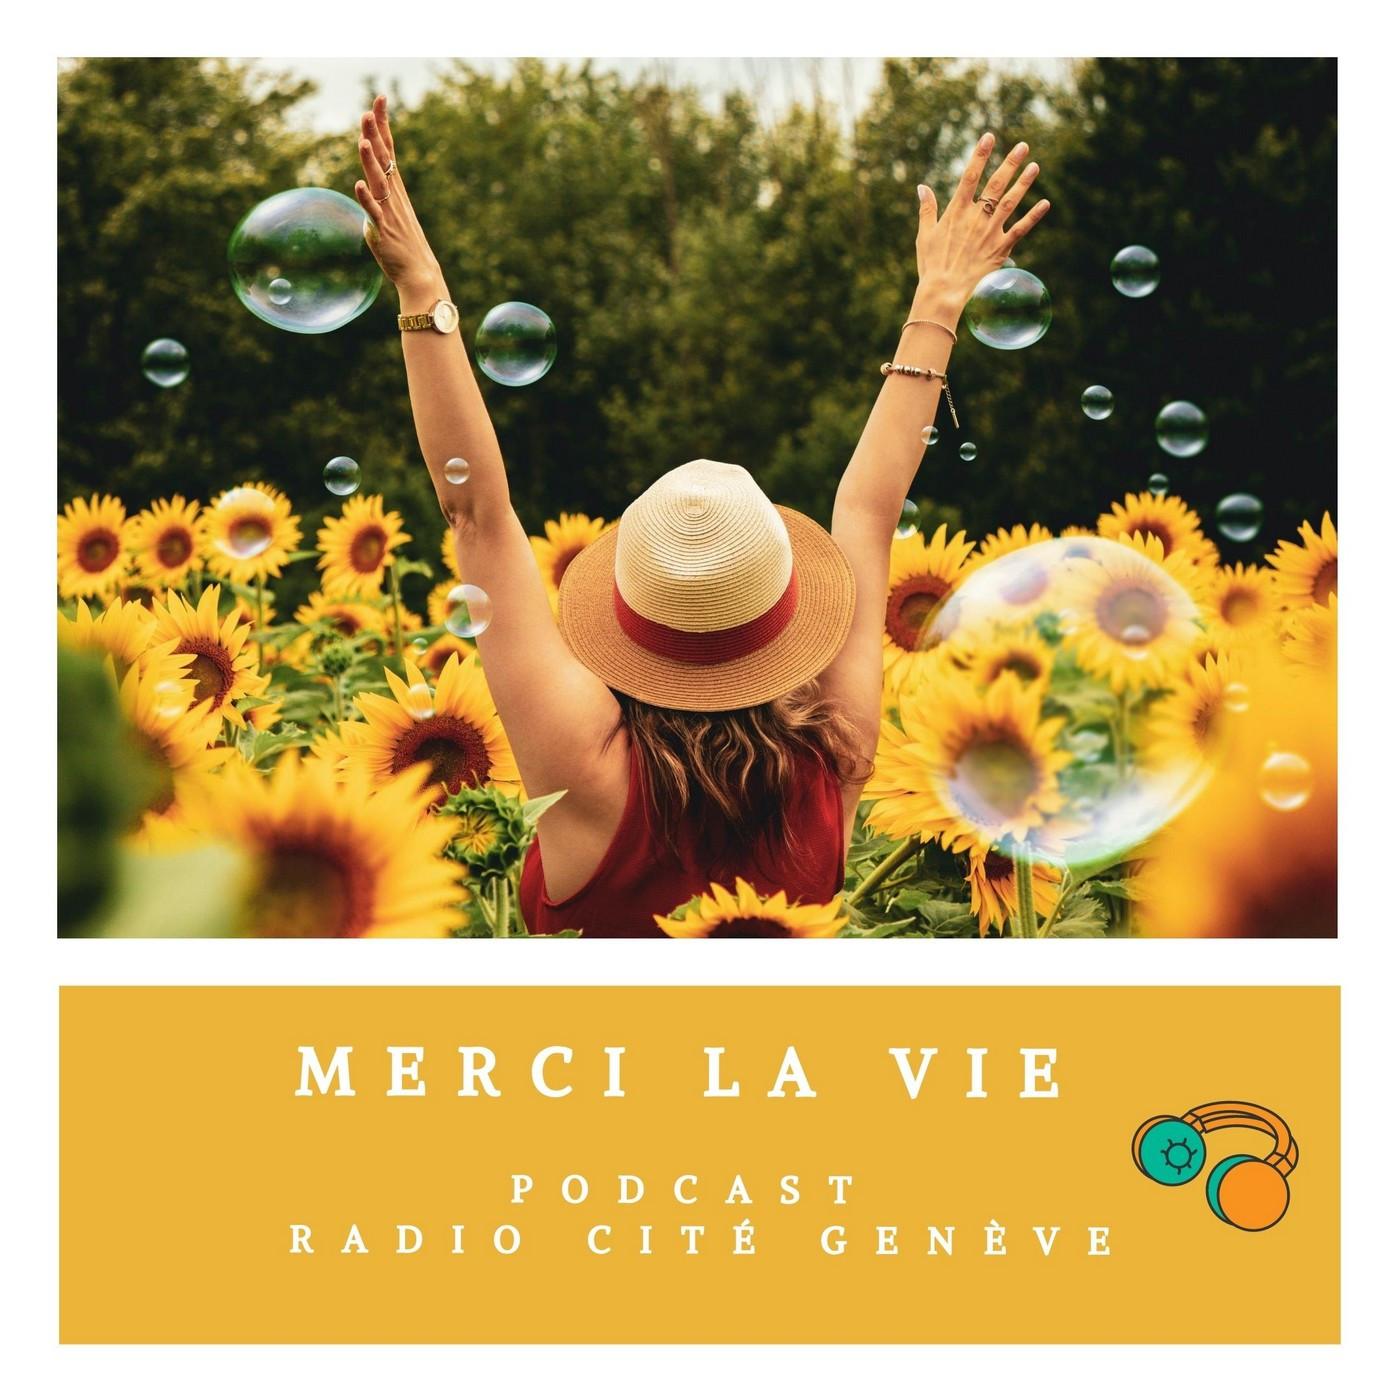 Merci la Vie du 05/01/21 - Denis Favrichon